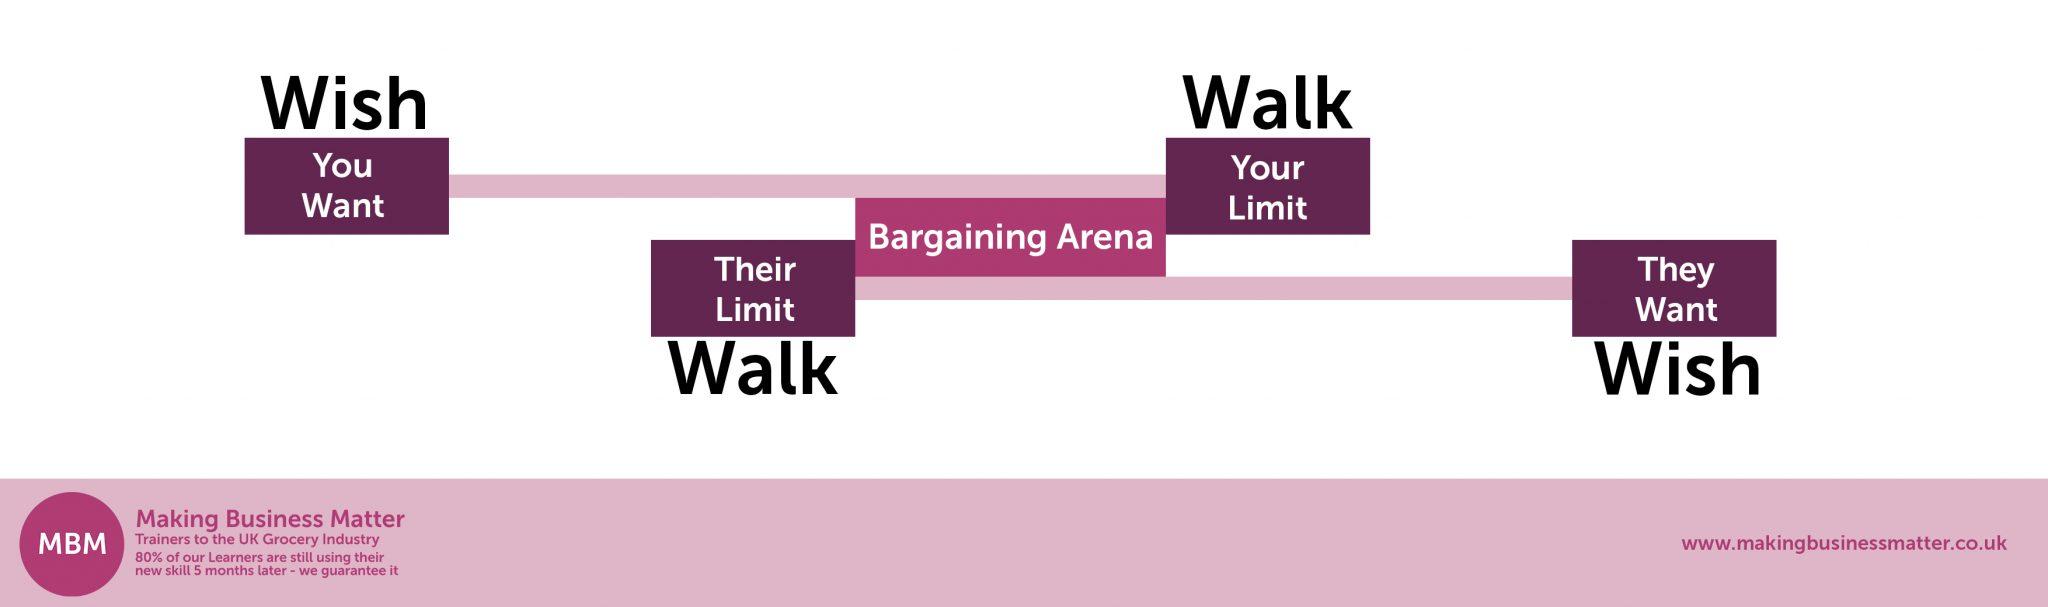 Wish - Walk, Walk Wish Diagram